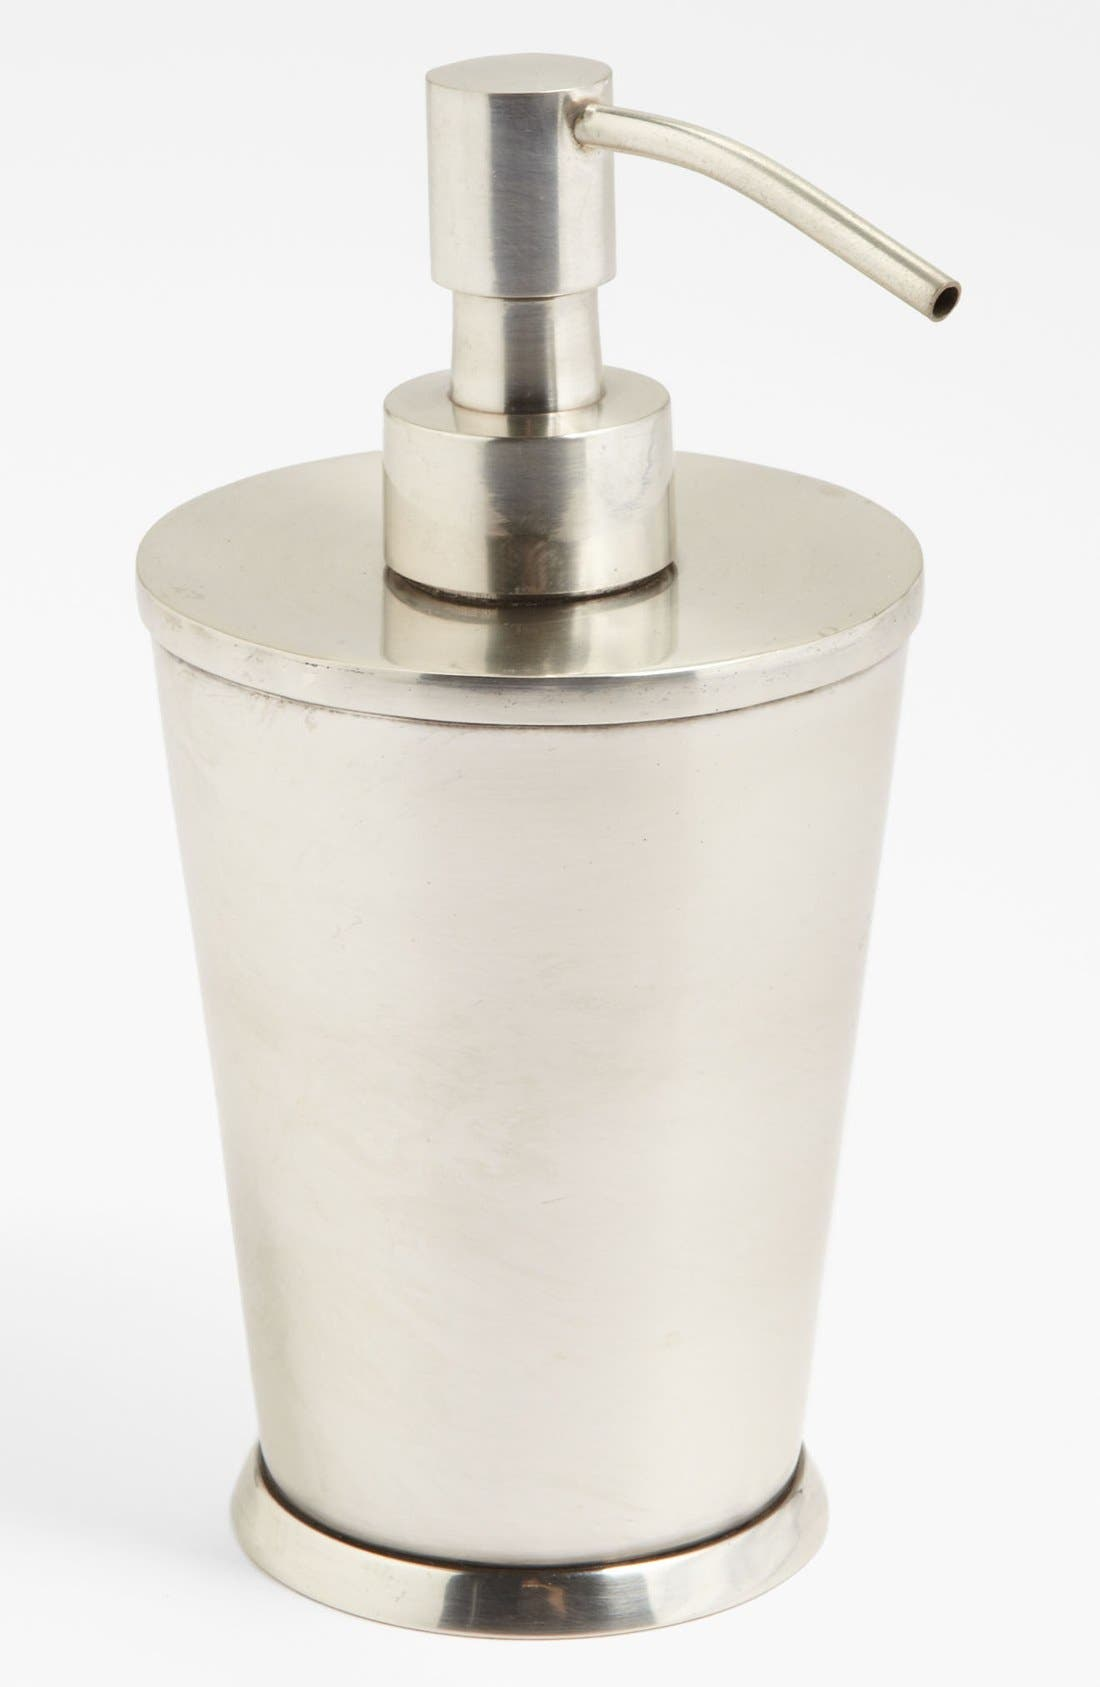 Main Image - Waterworks Studio 'Wallingford' Soap Dispenser (Online Only)